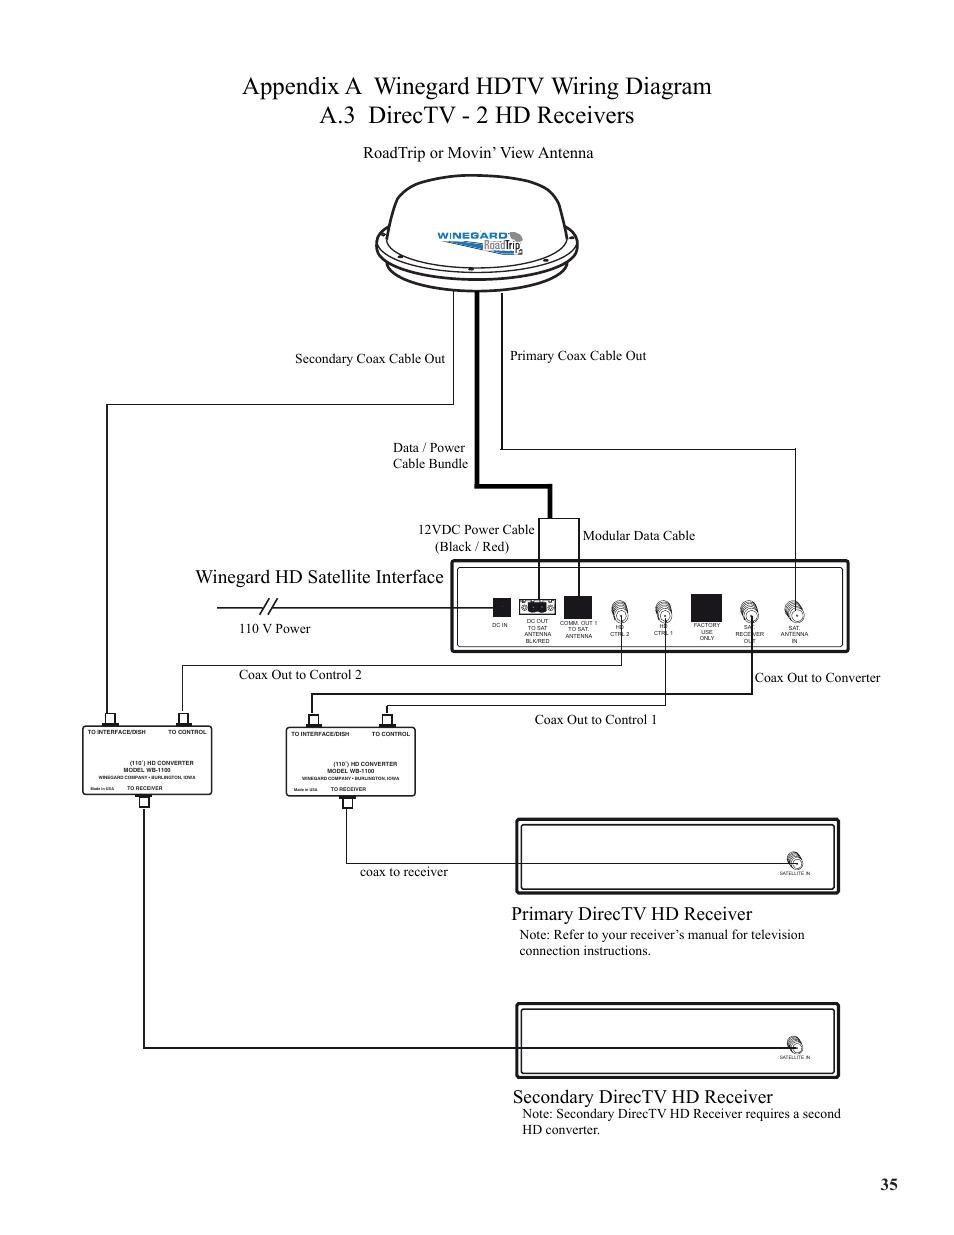 hight resolution of winegard hd satellite interface primary directv hd receiver secondary directv hd receiver roadtrip